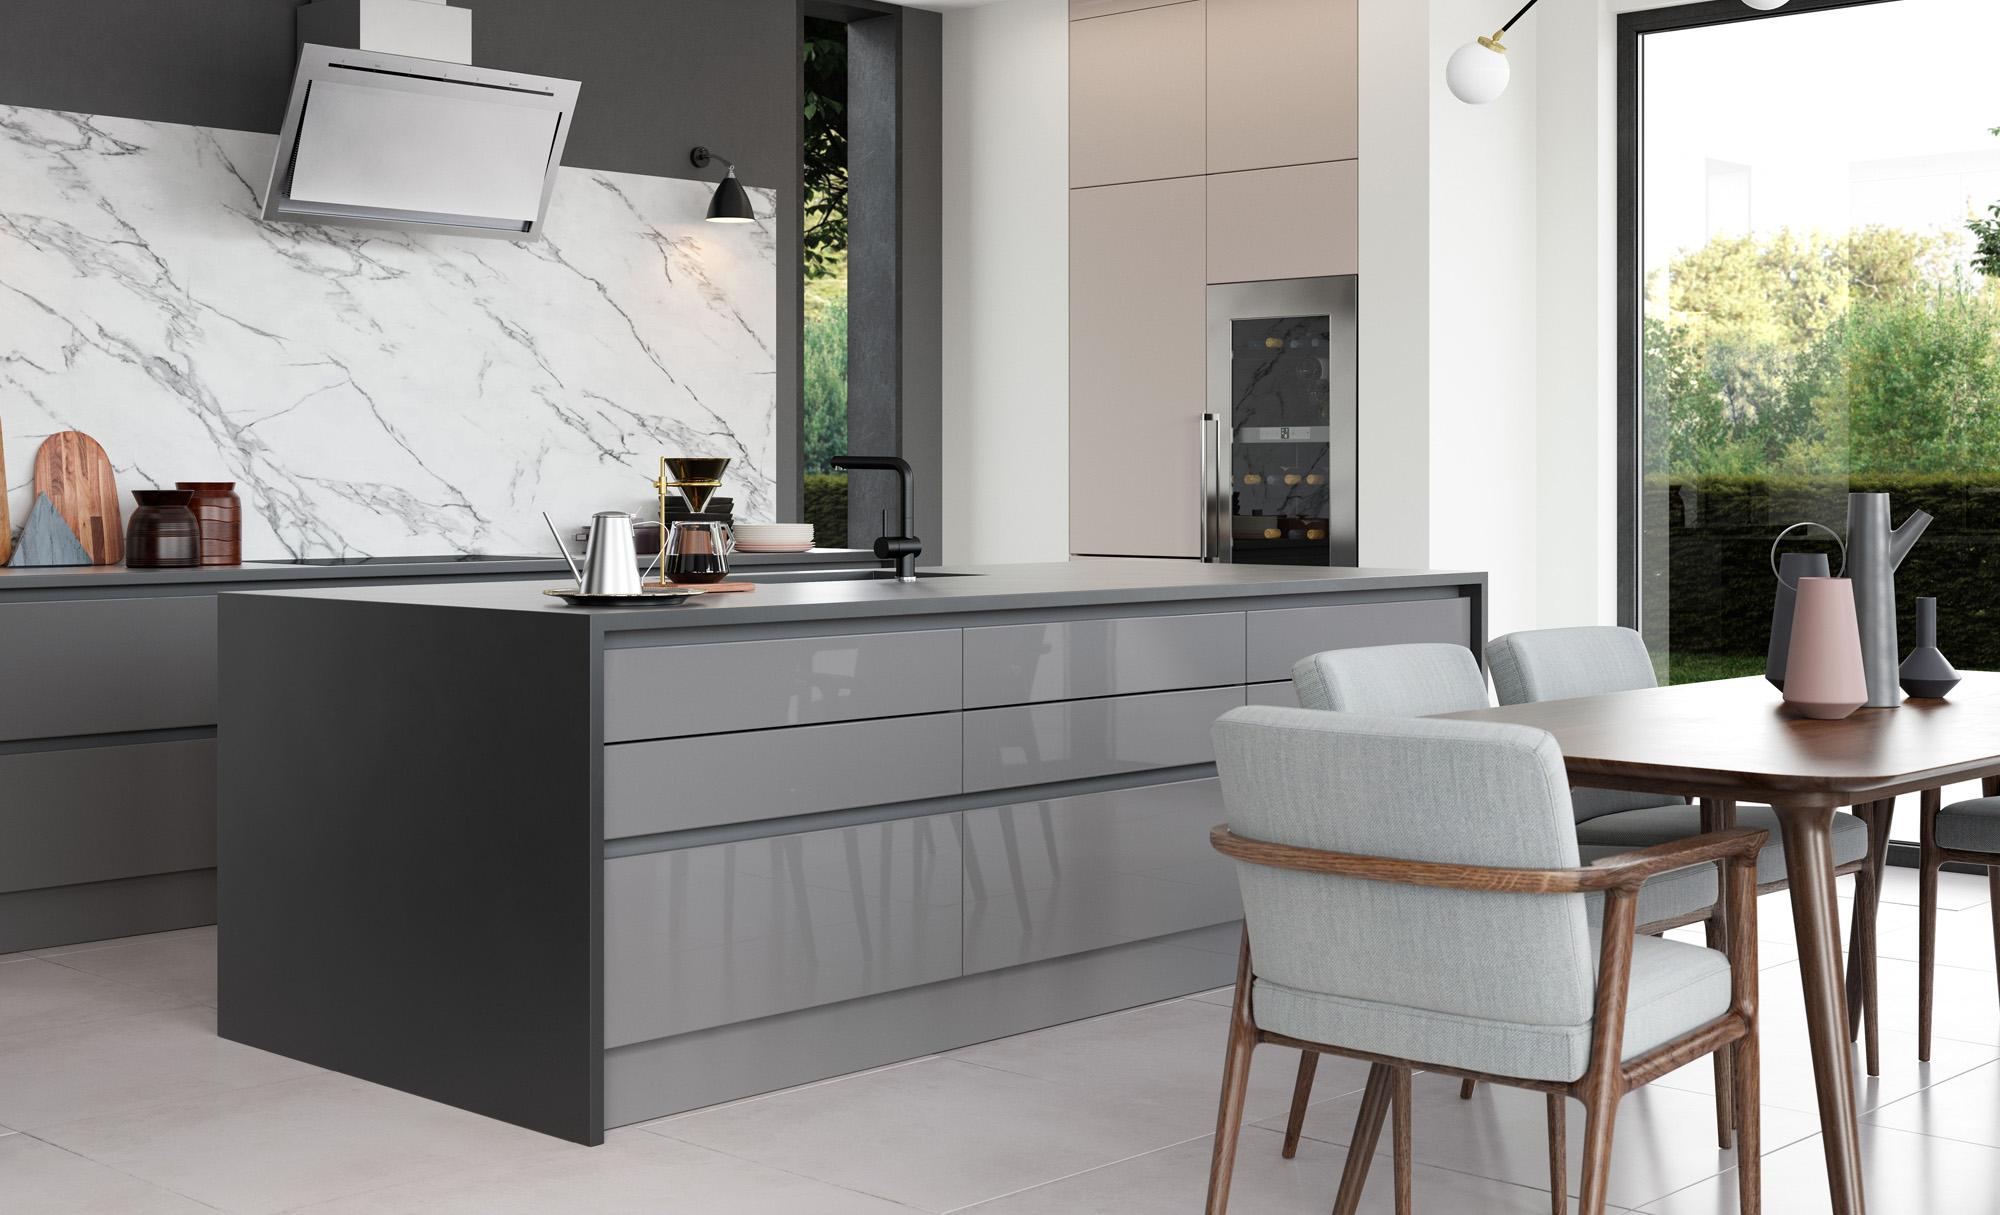 modern-contemporary-zola-gloss-dust-grey-cashmere-tavola-stained-anthracite-kitchen-hero.jpg